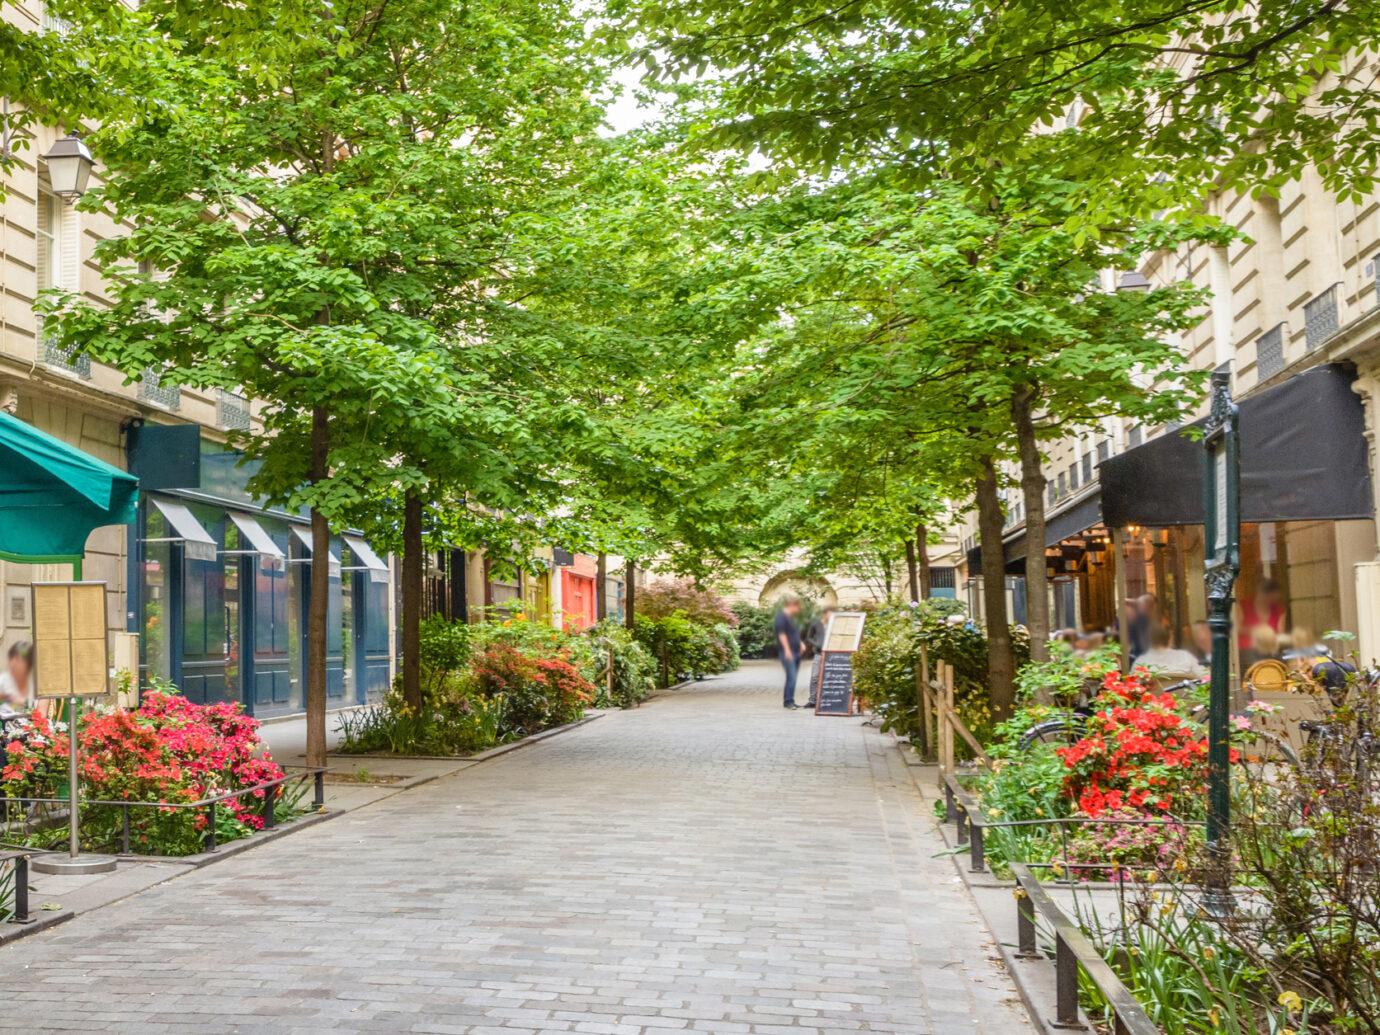 A quiet street with restaurants in the bohemian Marais district of Paris.